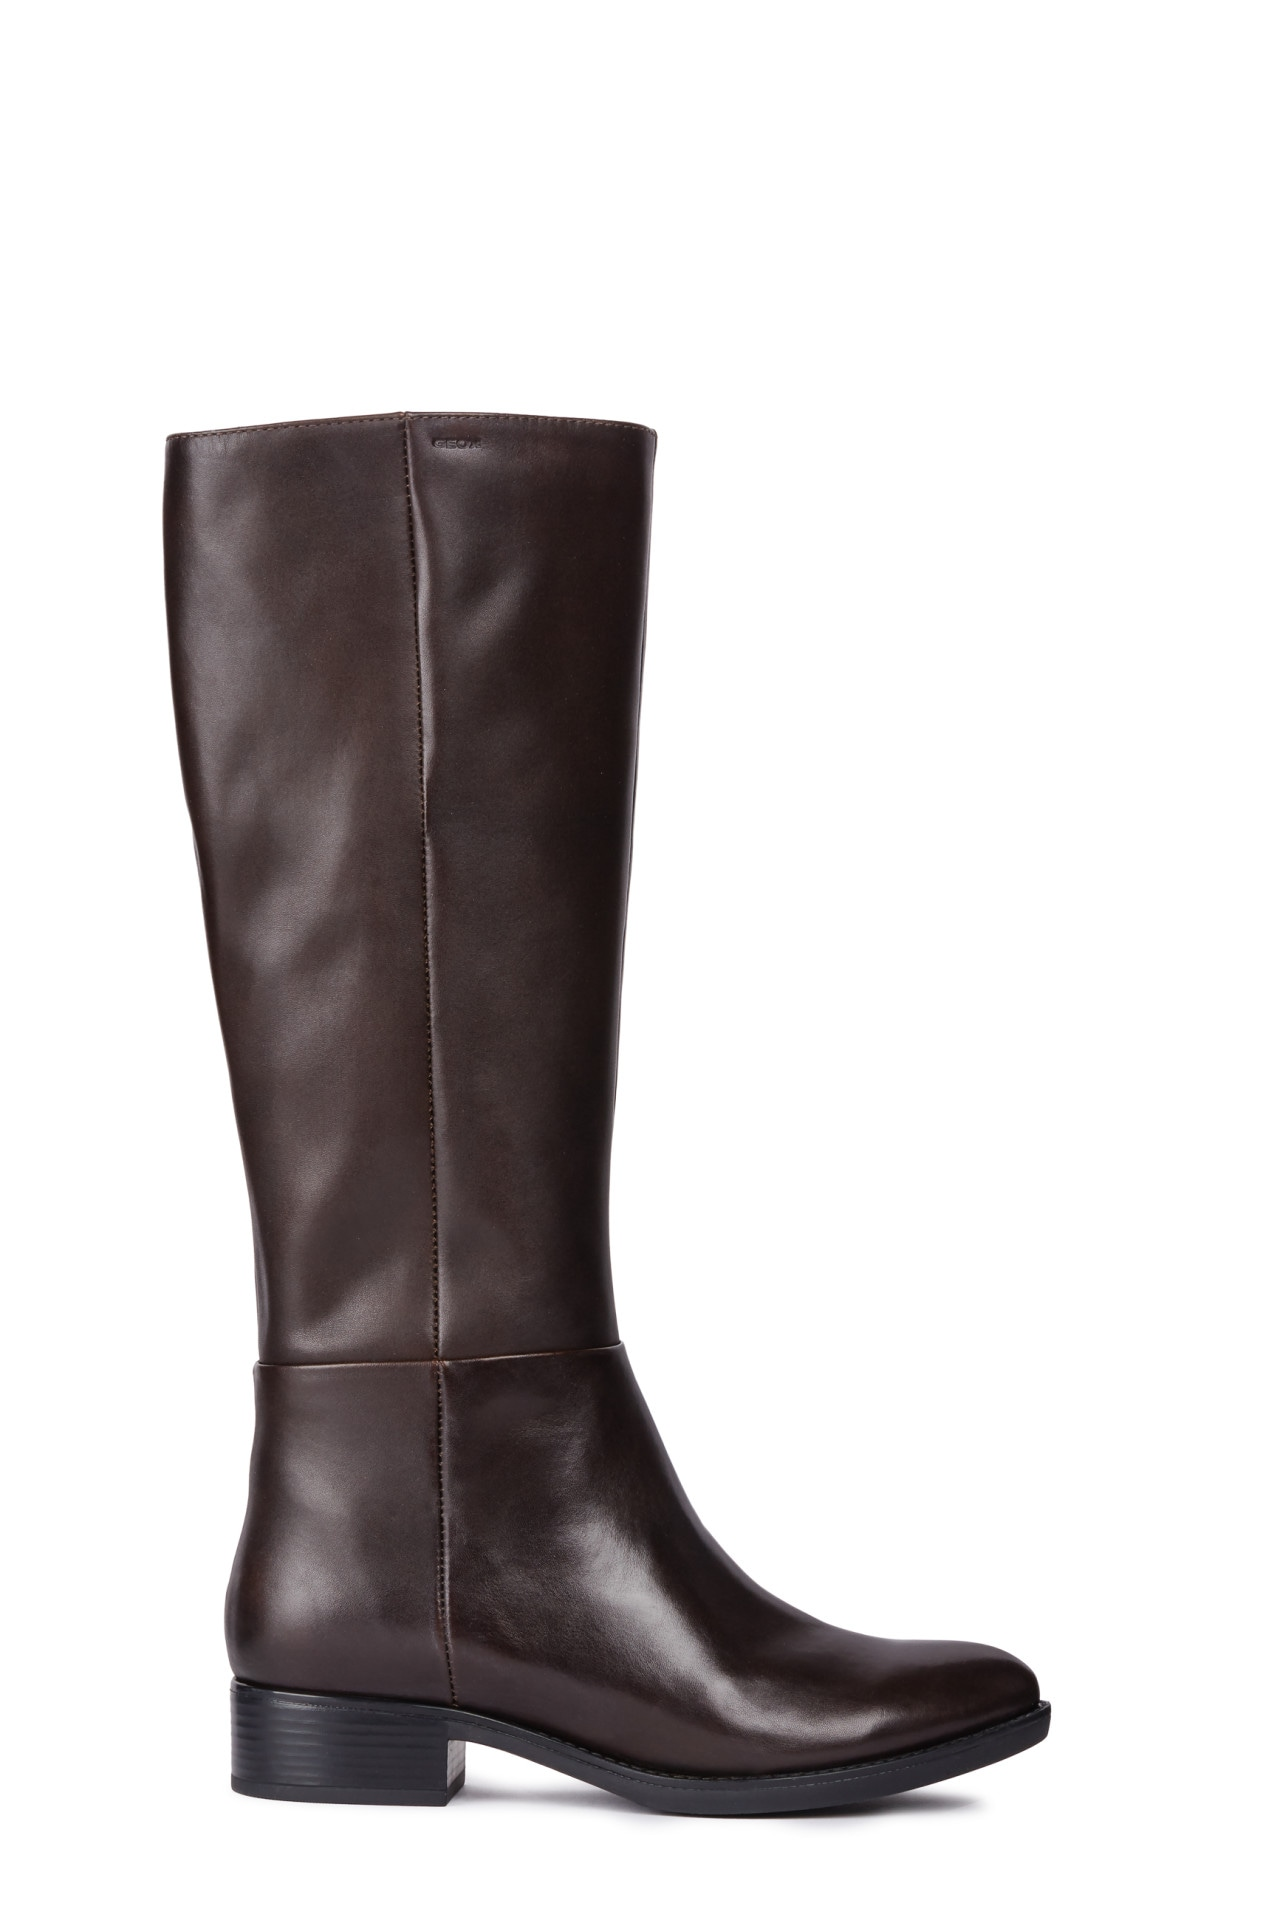 GEOX FELICITY D dámske topánky